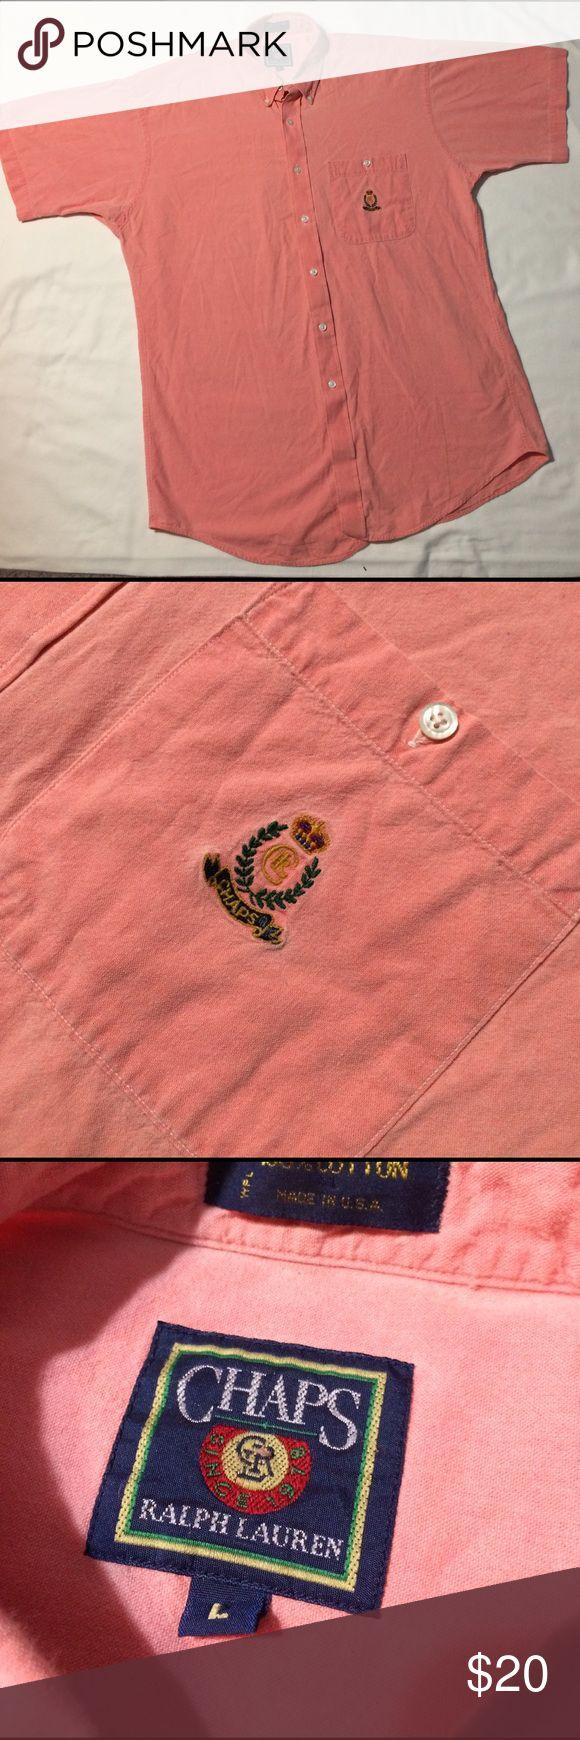 🔥VTG chaps Ralph Lauren button down! 100% cotton! Amazing Chaps Ralph Lauren 100% cotton button down! Pink/salmon with chaps crescent on breast pocket! Condition: 10/10 Sz. L Ralph Lauren Shirts Casual Button Down Shirts